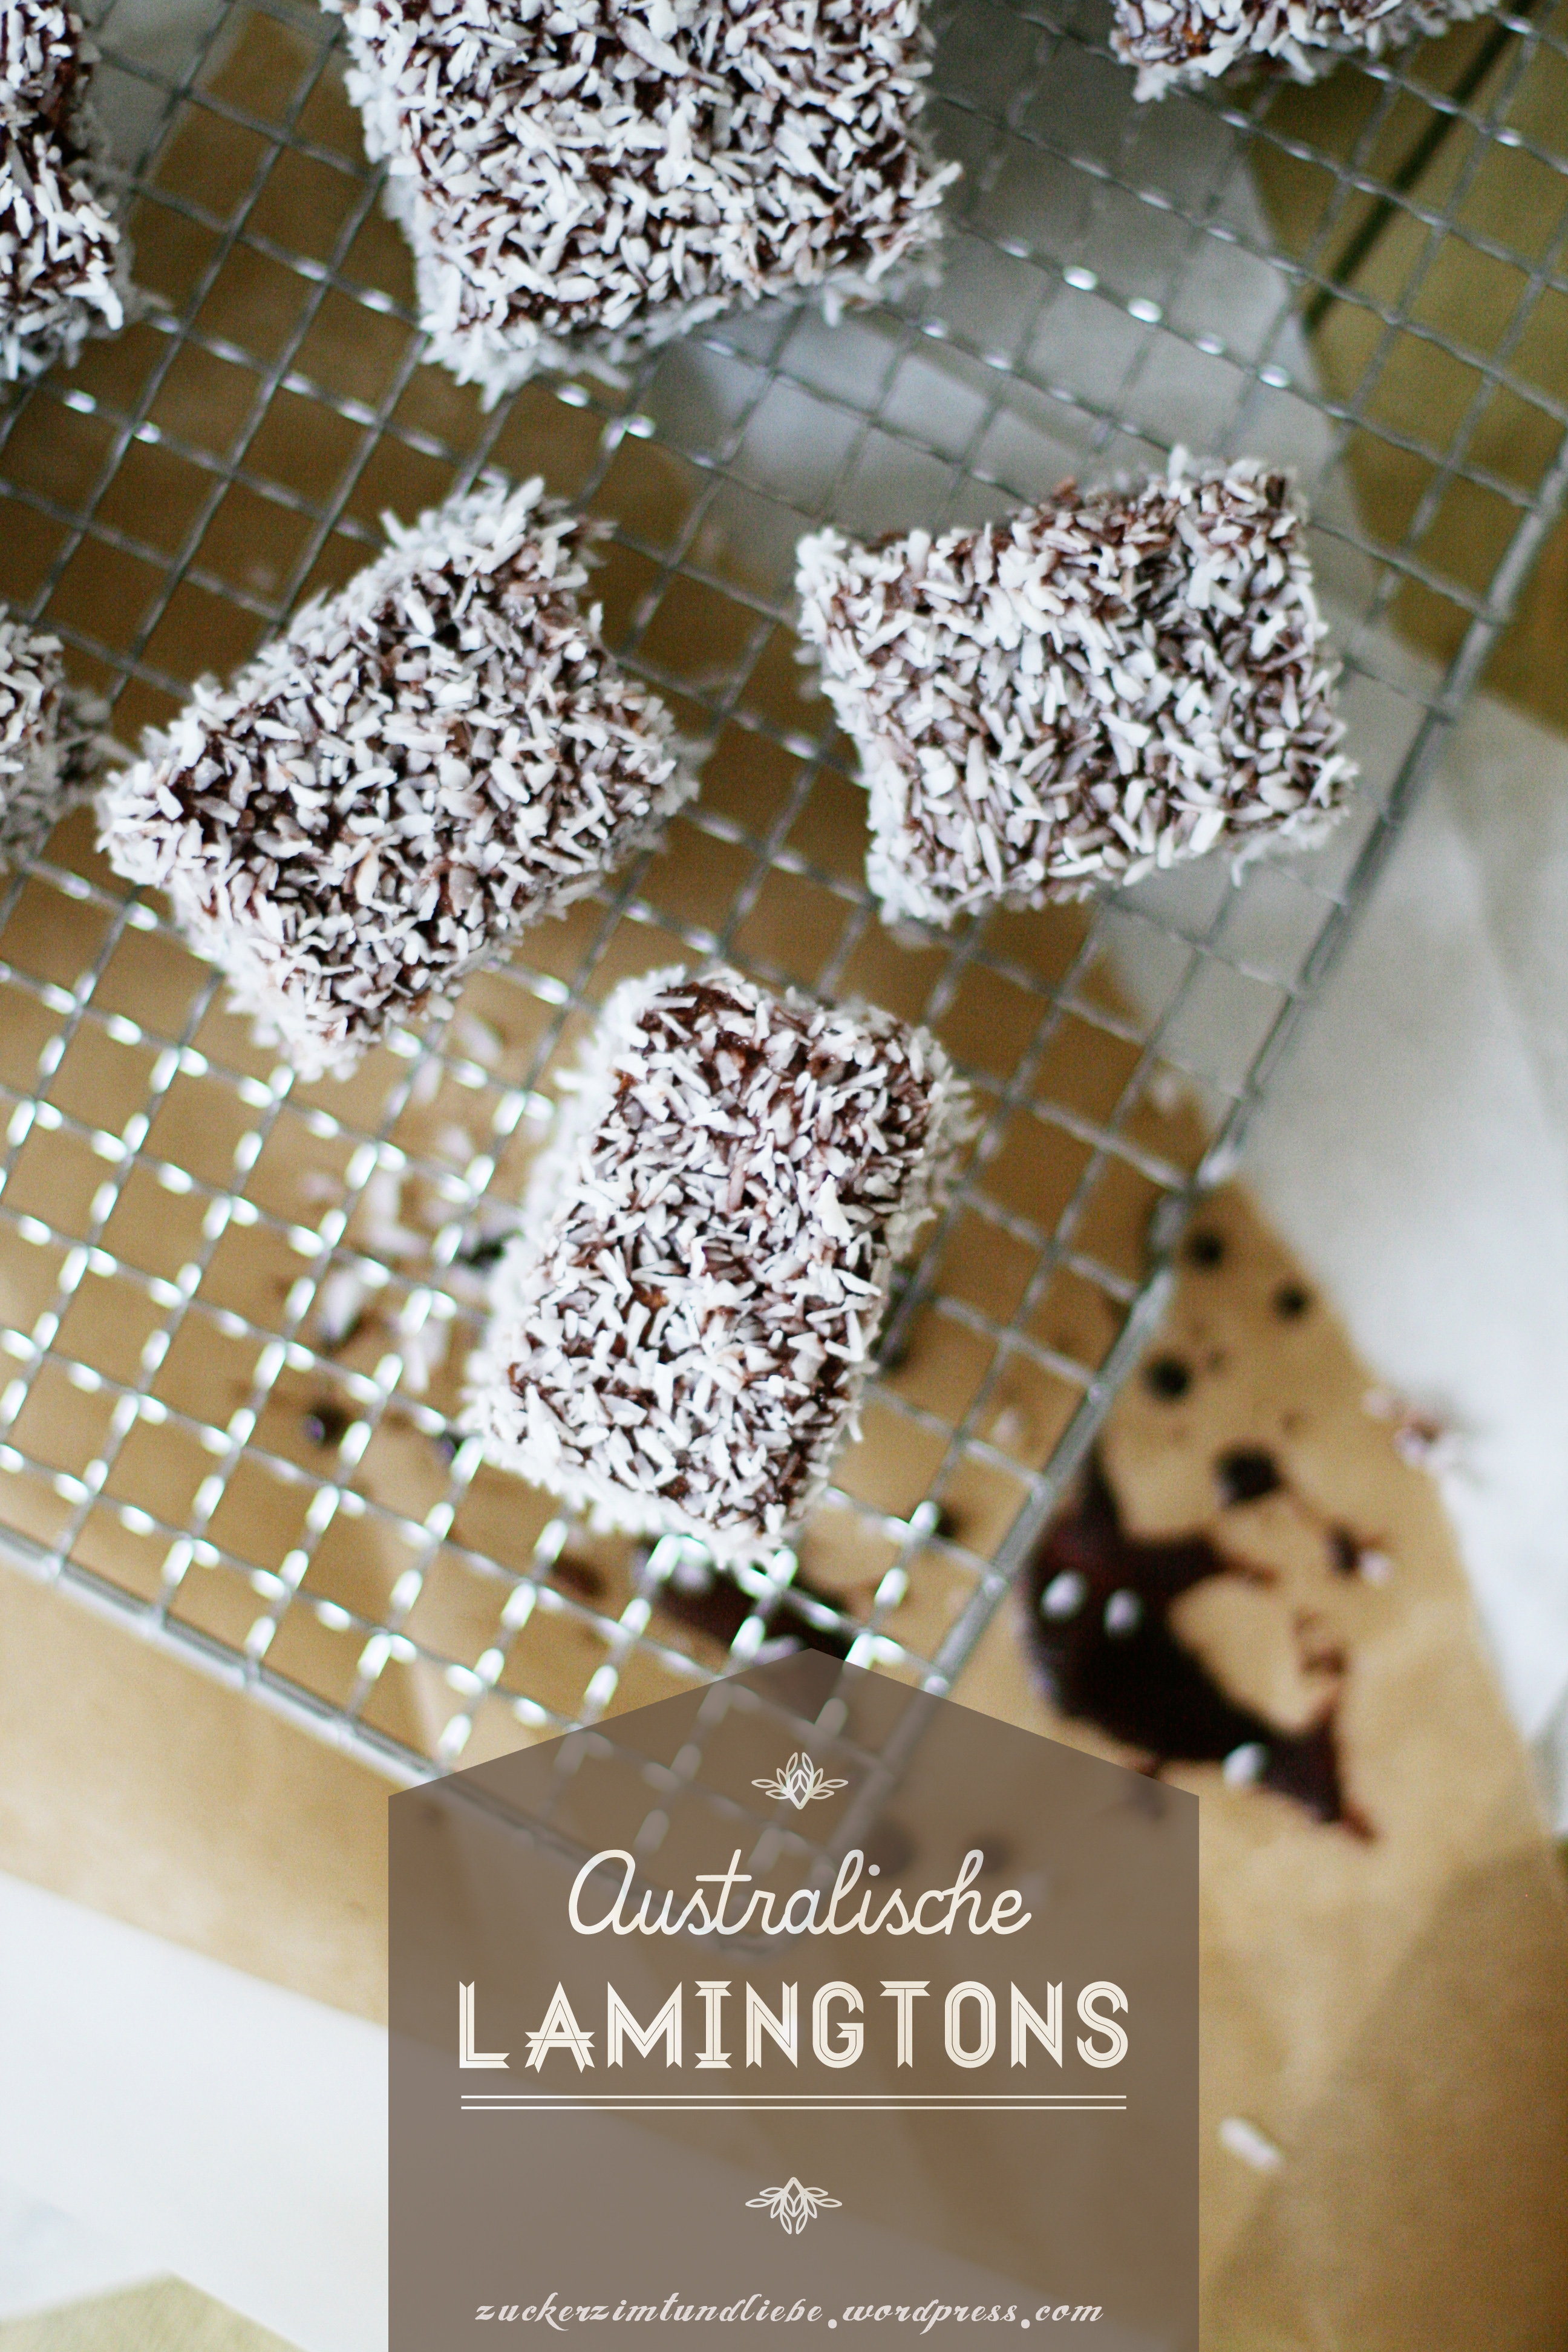 Lamington rezept recipe Kokoskuchen Schokokuchen Foodstyling australische rezepte zuckerzimtundliebe foodstylist